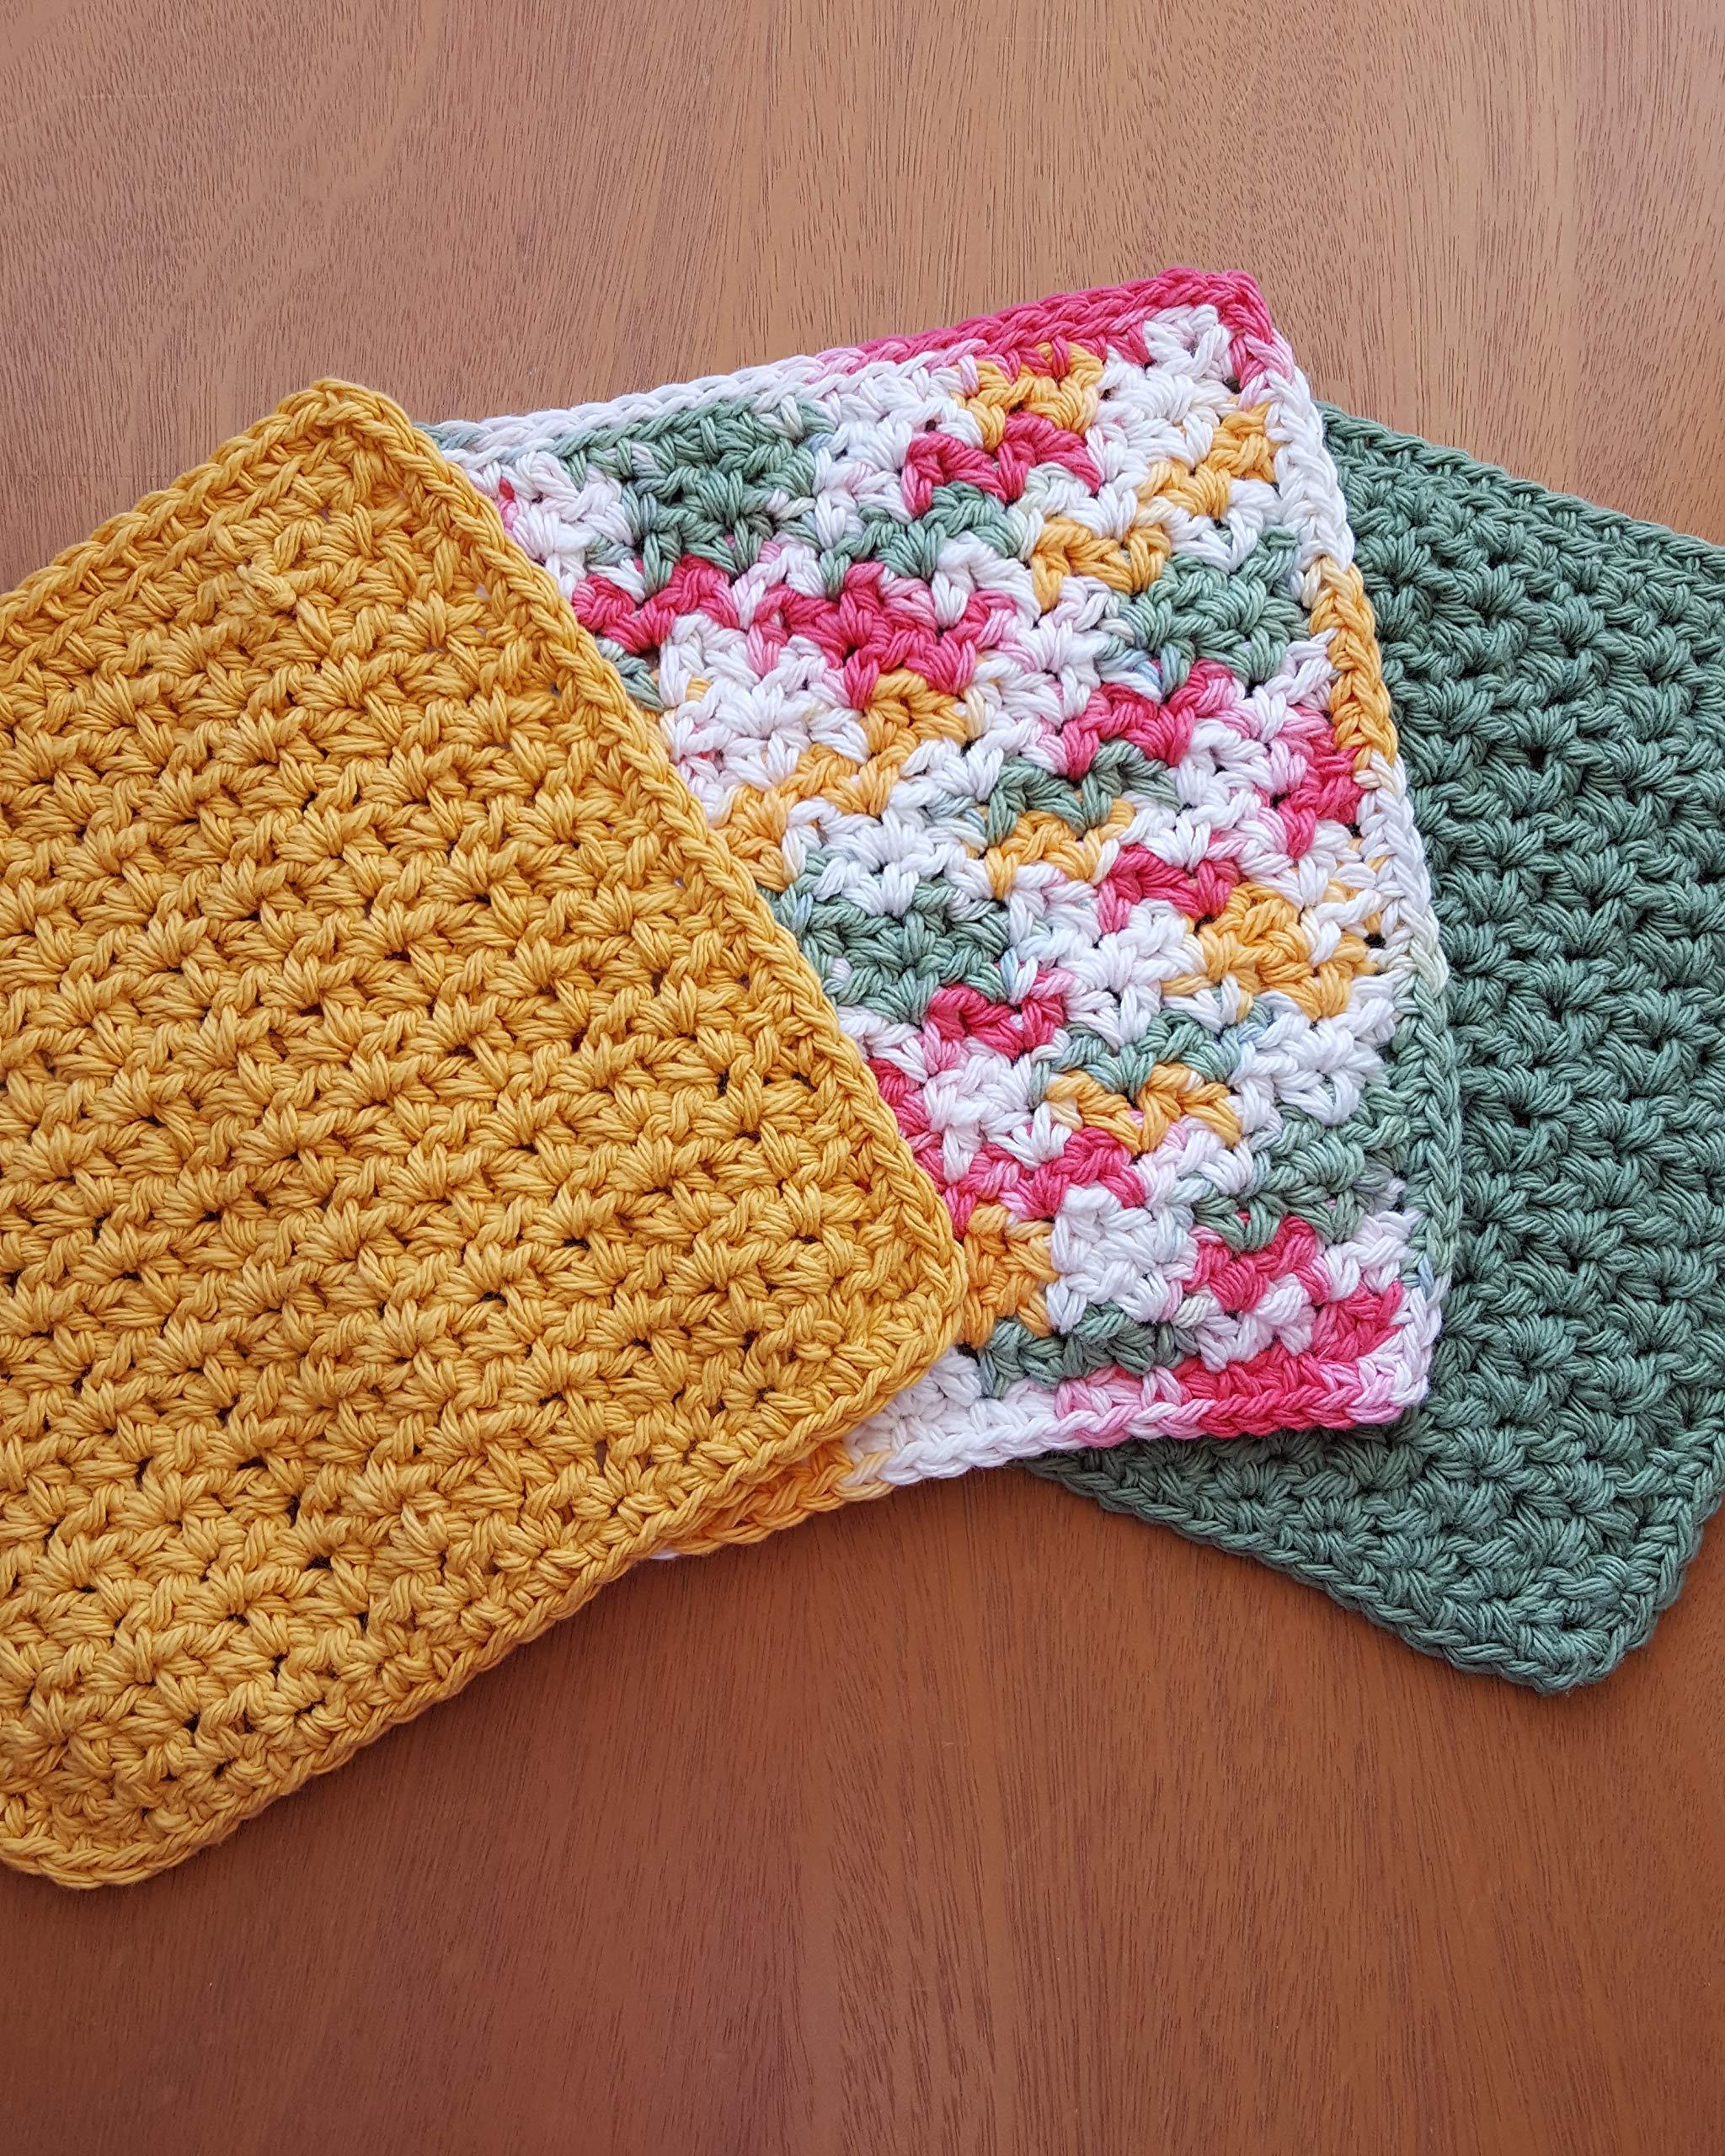 Handmade crochet washcloths, dishcloths, rags or wipes 100% cotton set of 3 (7.5x7.5inch)